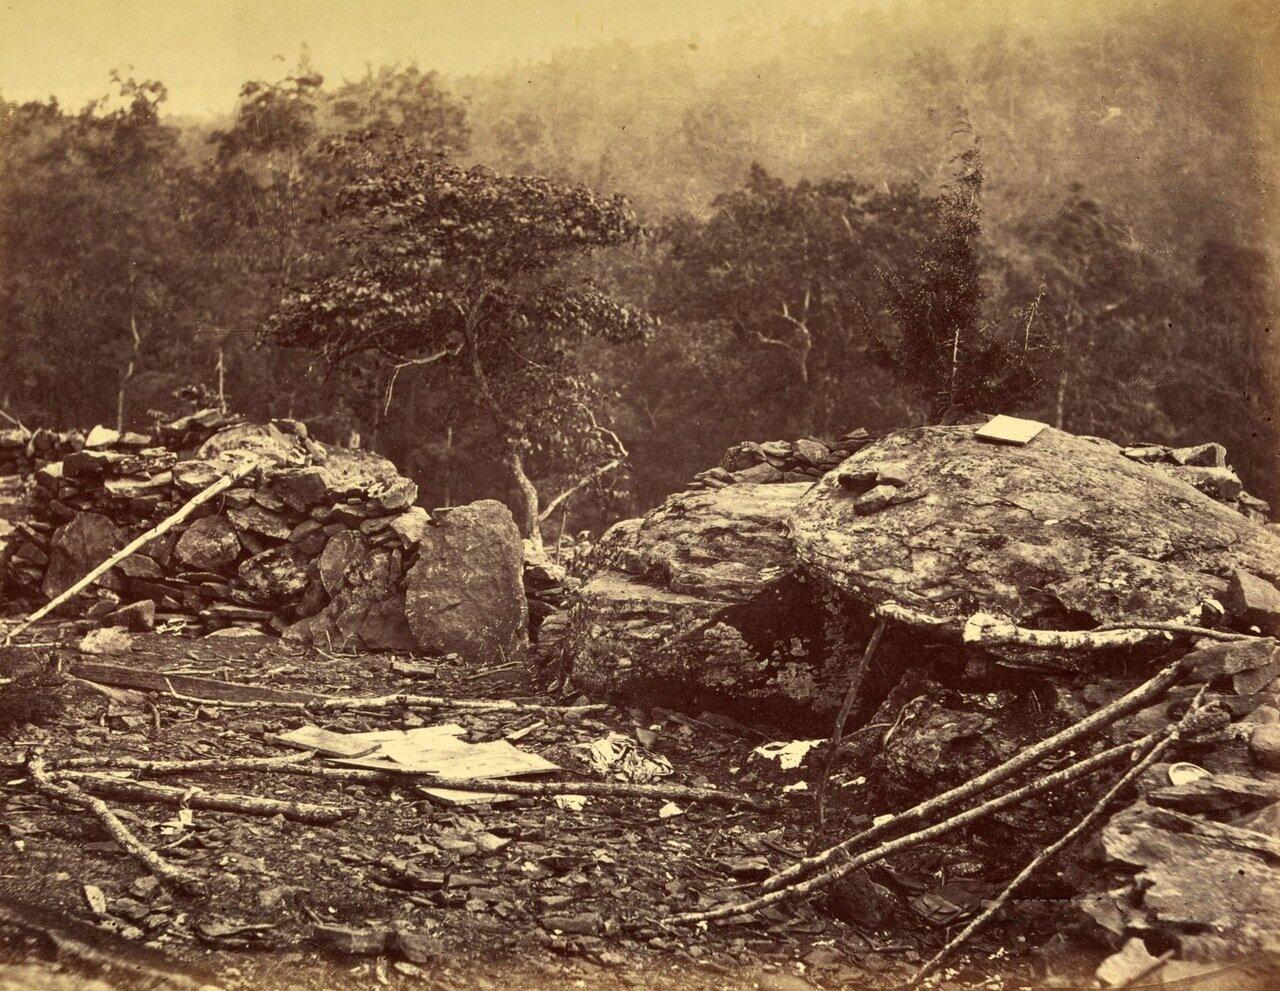 Бруствер на Round Top во время битвы при Геттисберге